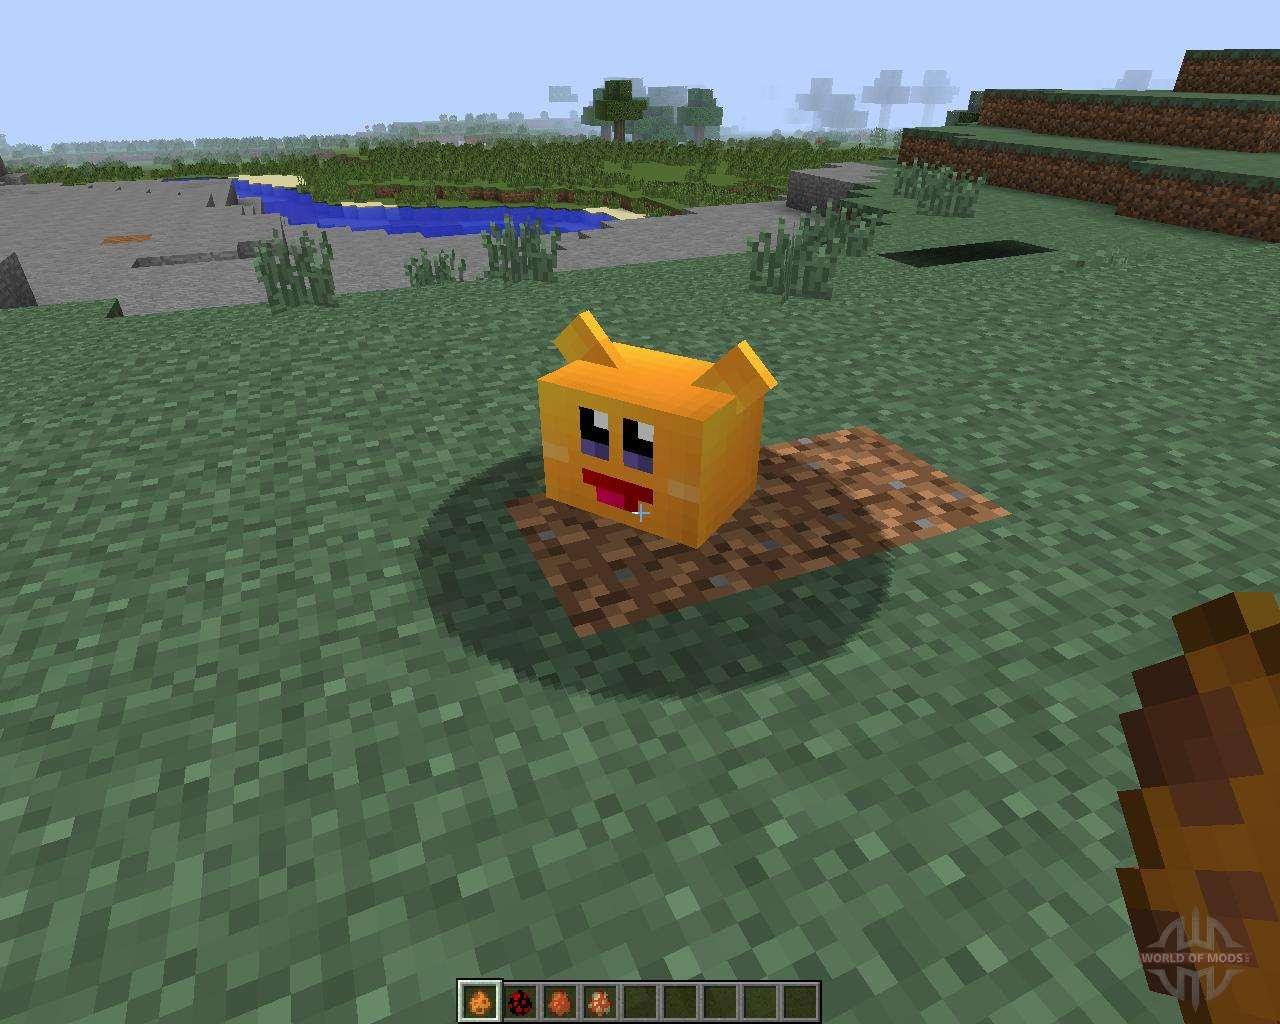 MINECRAFT FORGE API - Minecraft Forge API (1 3 2/1 4 2)